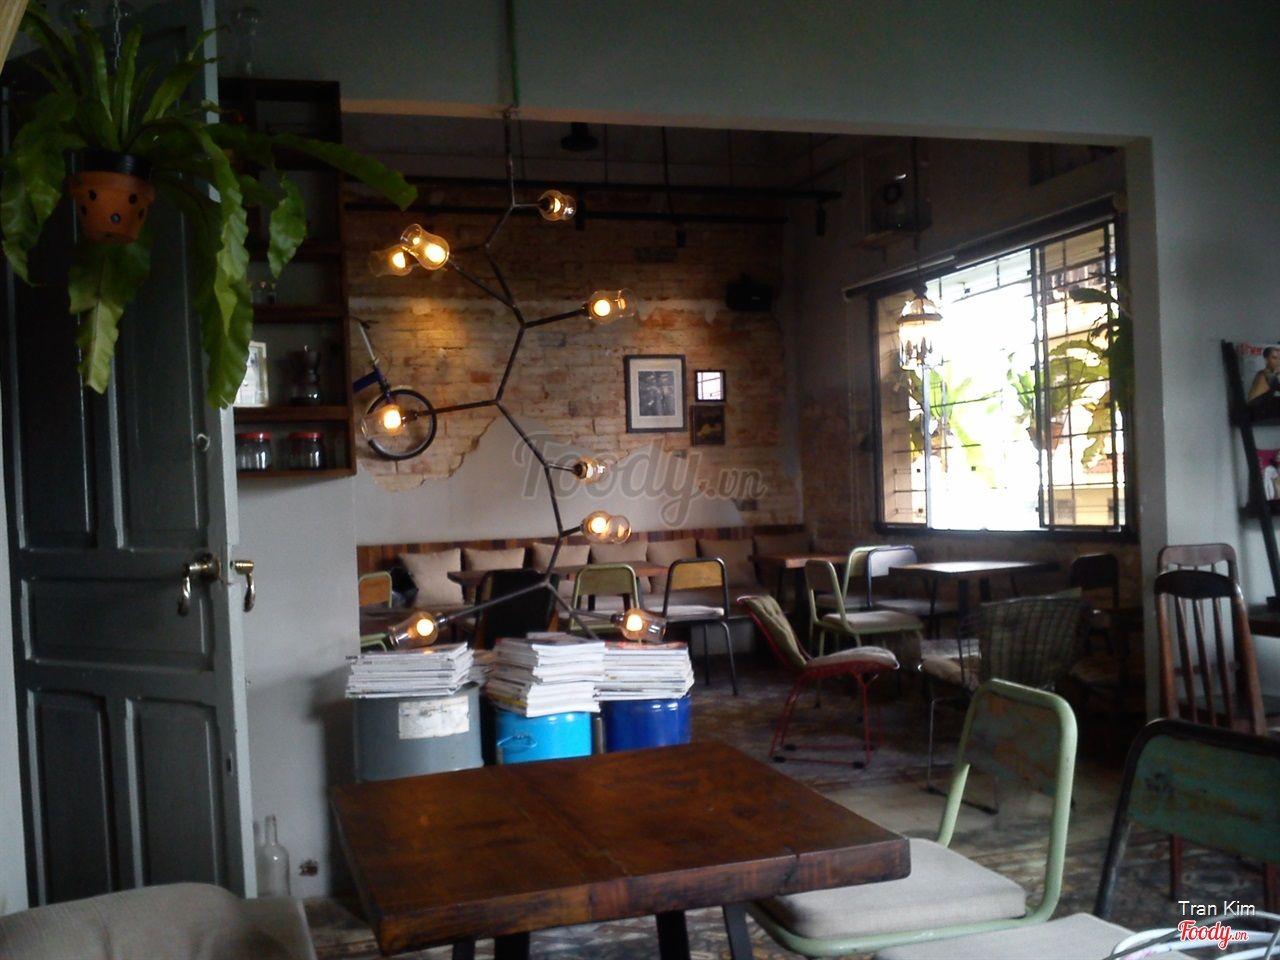 bang-khuang-cafe-1